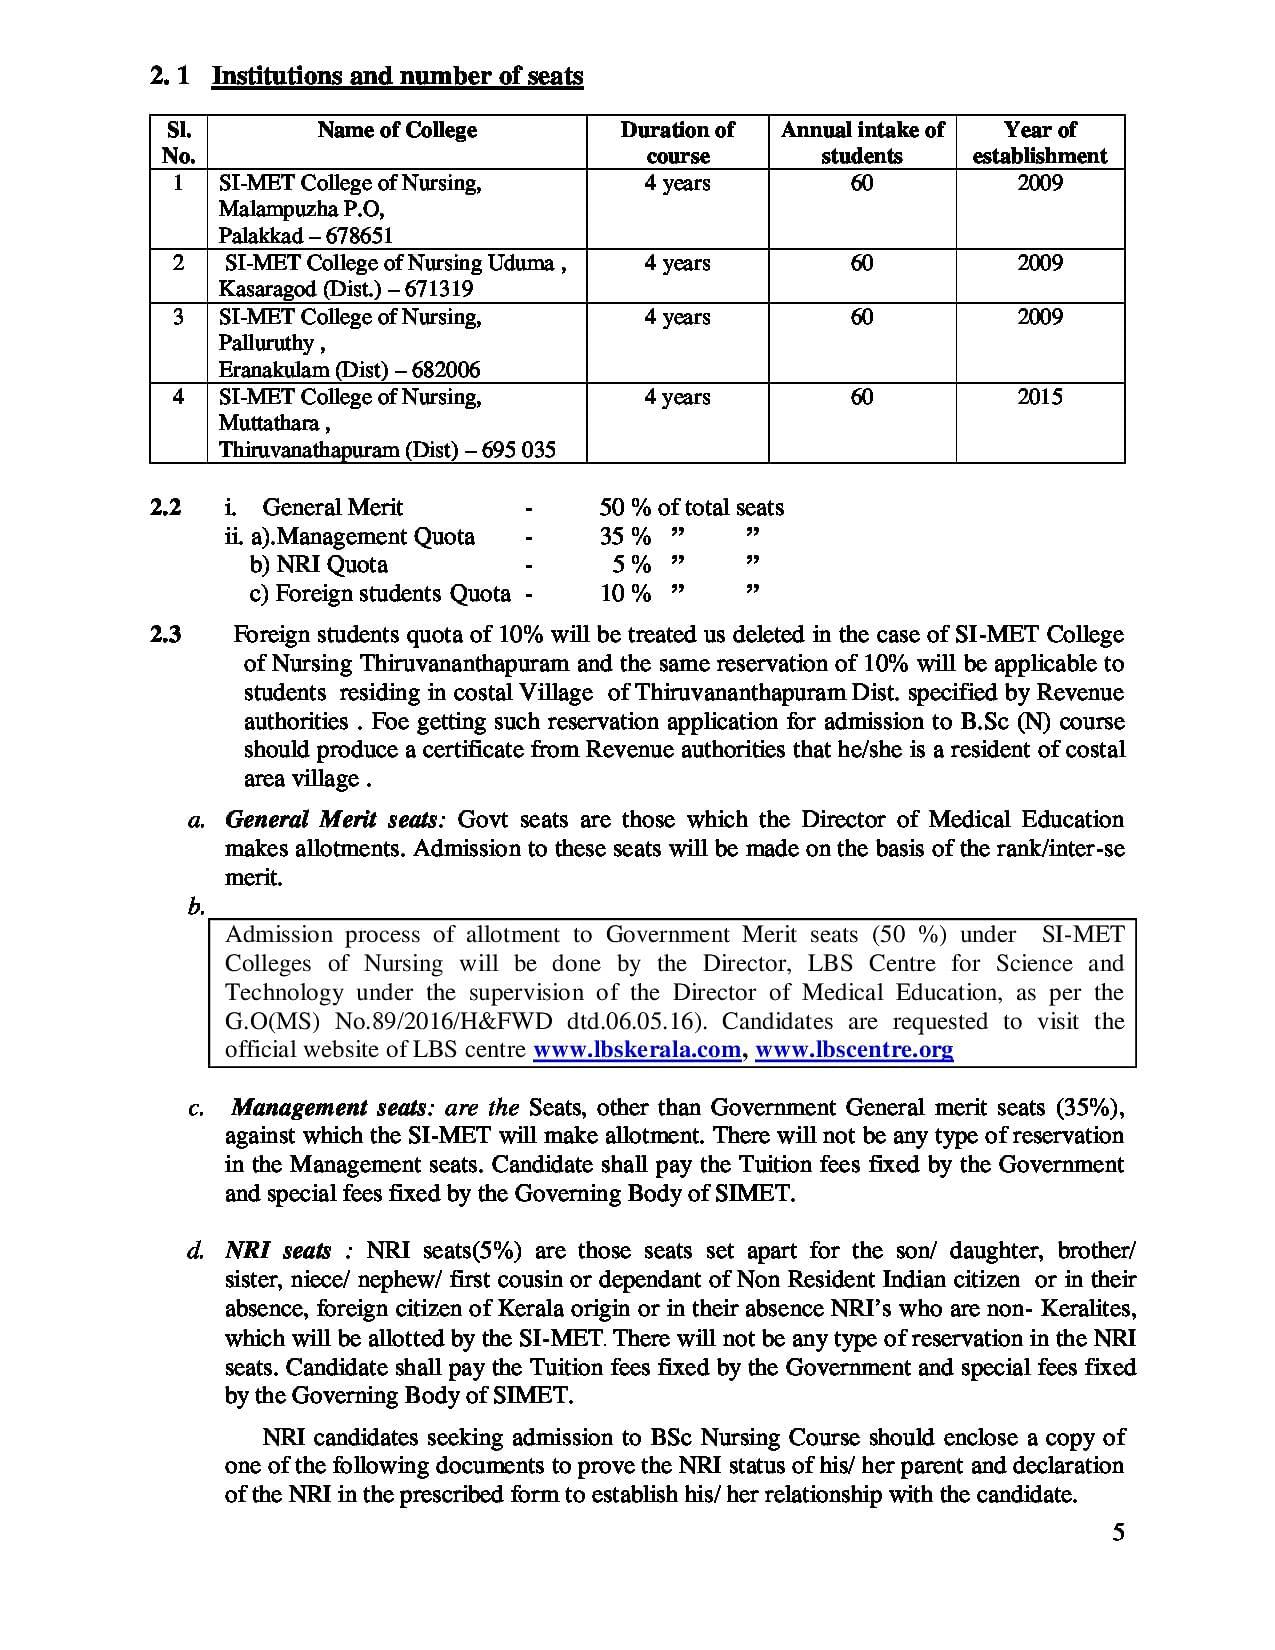 SIMET College of Nursing Mangattuparamba, Kannur - Admissions